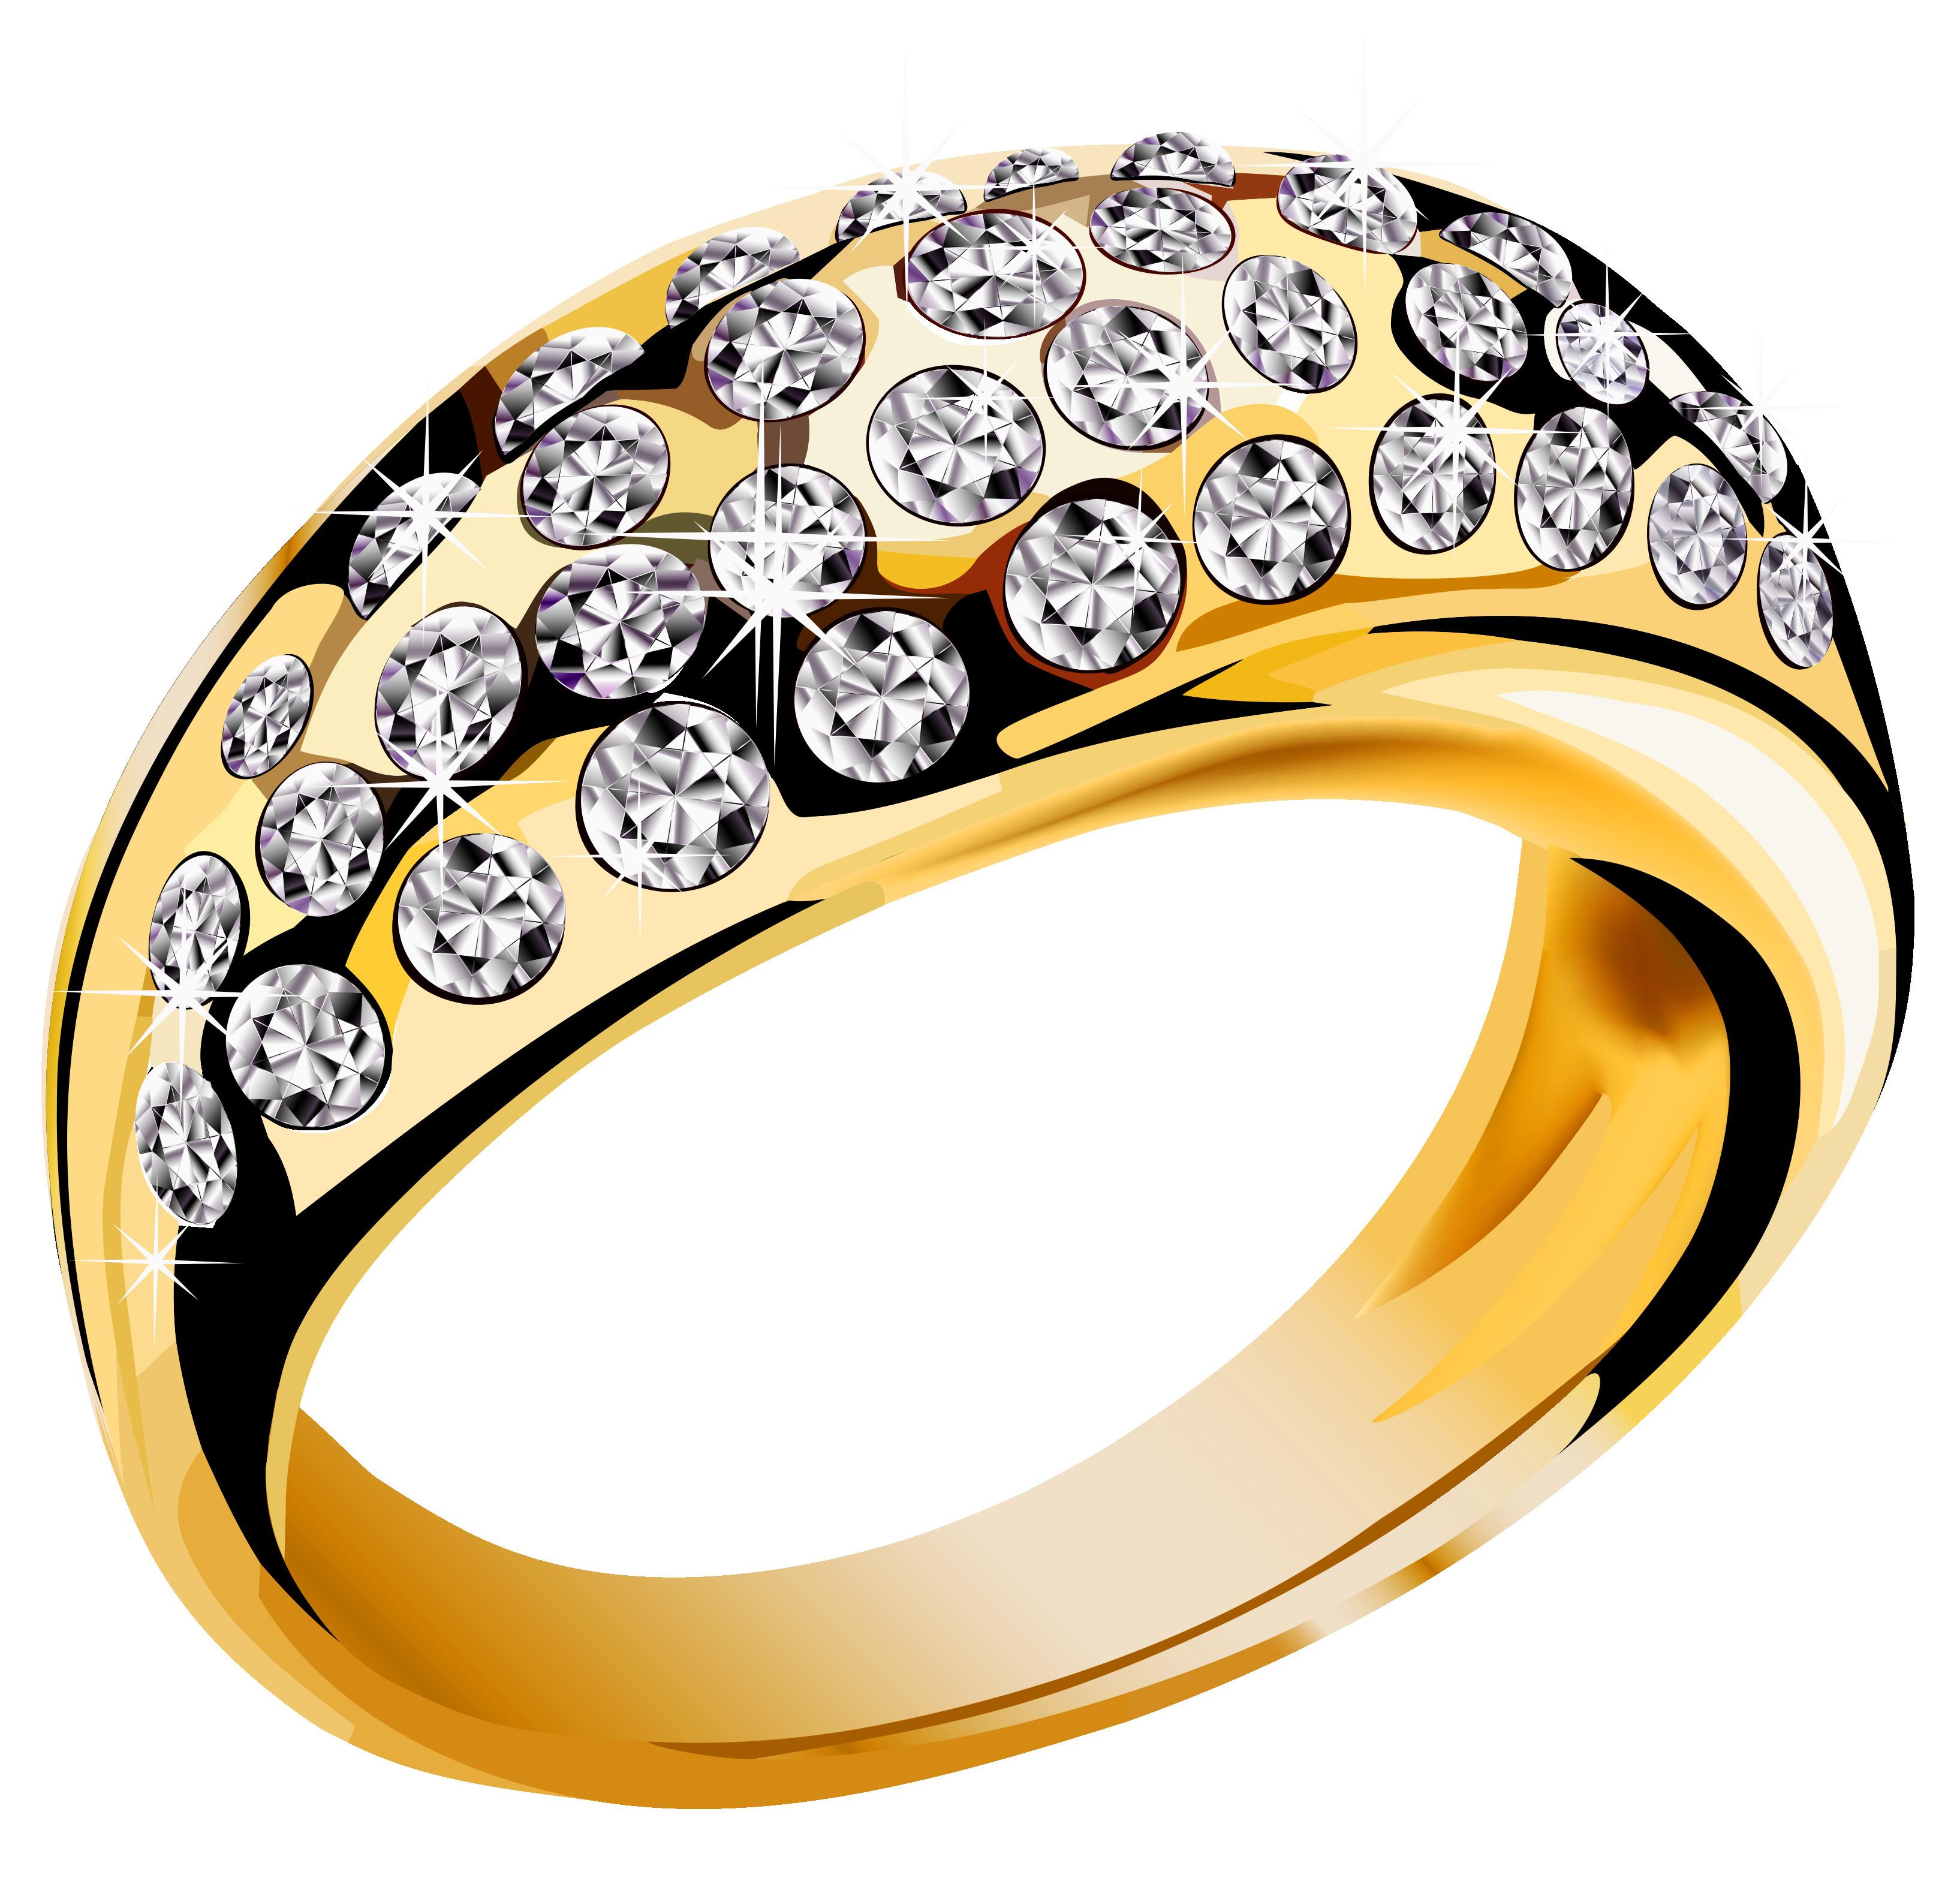 3269x3132 Wedding Rings Png Clip Art Best Web Clipart Endearing Enchanting